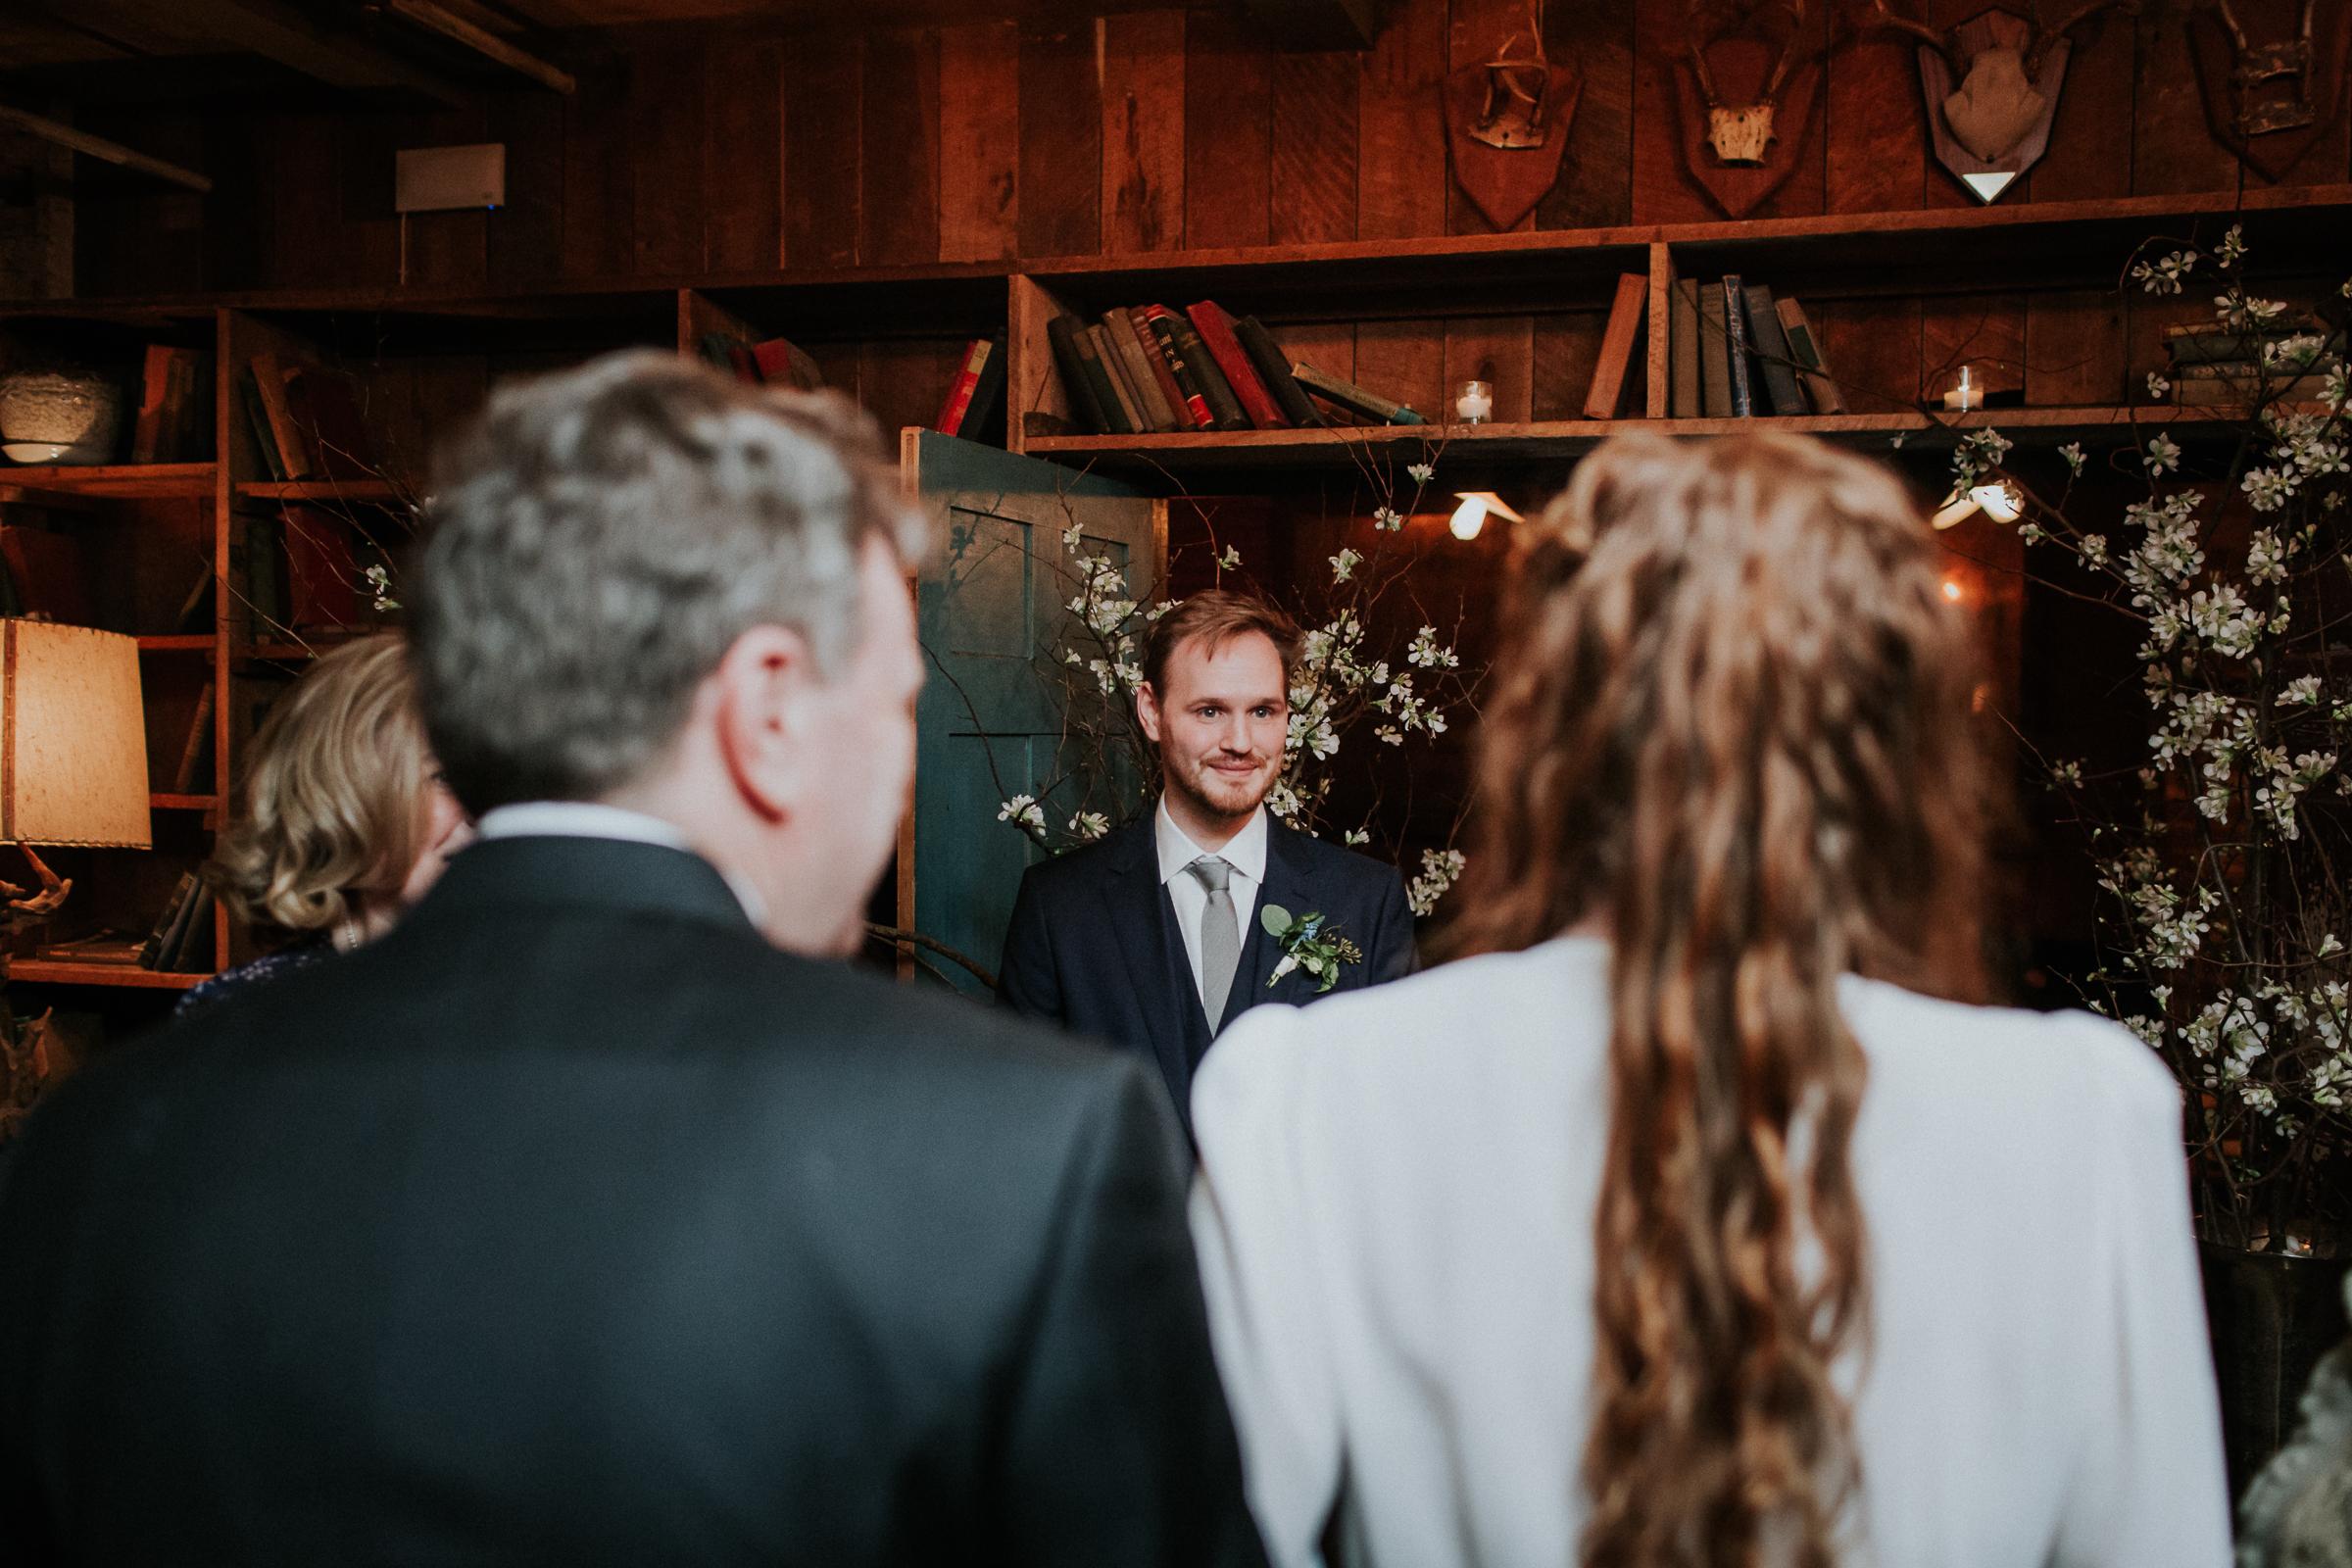 Freemans-Restaurant-Soho-Brooklyn-Bridge-Park-Dumbo-Documentary-Wedding-Photographer-44.jpg